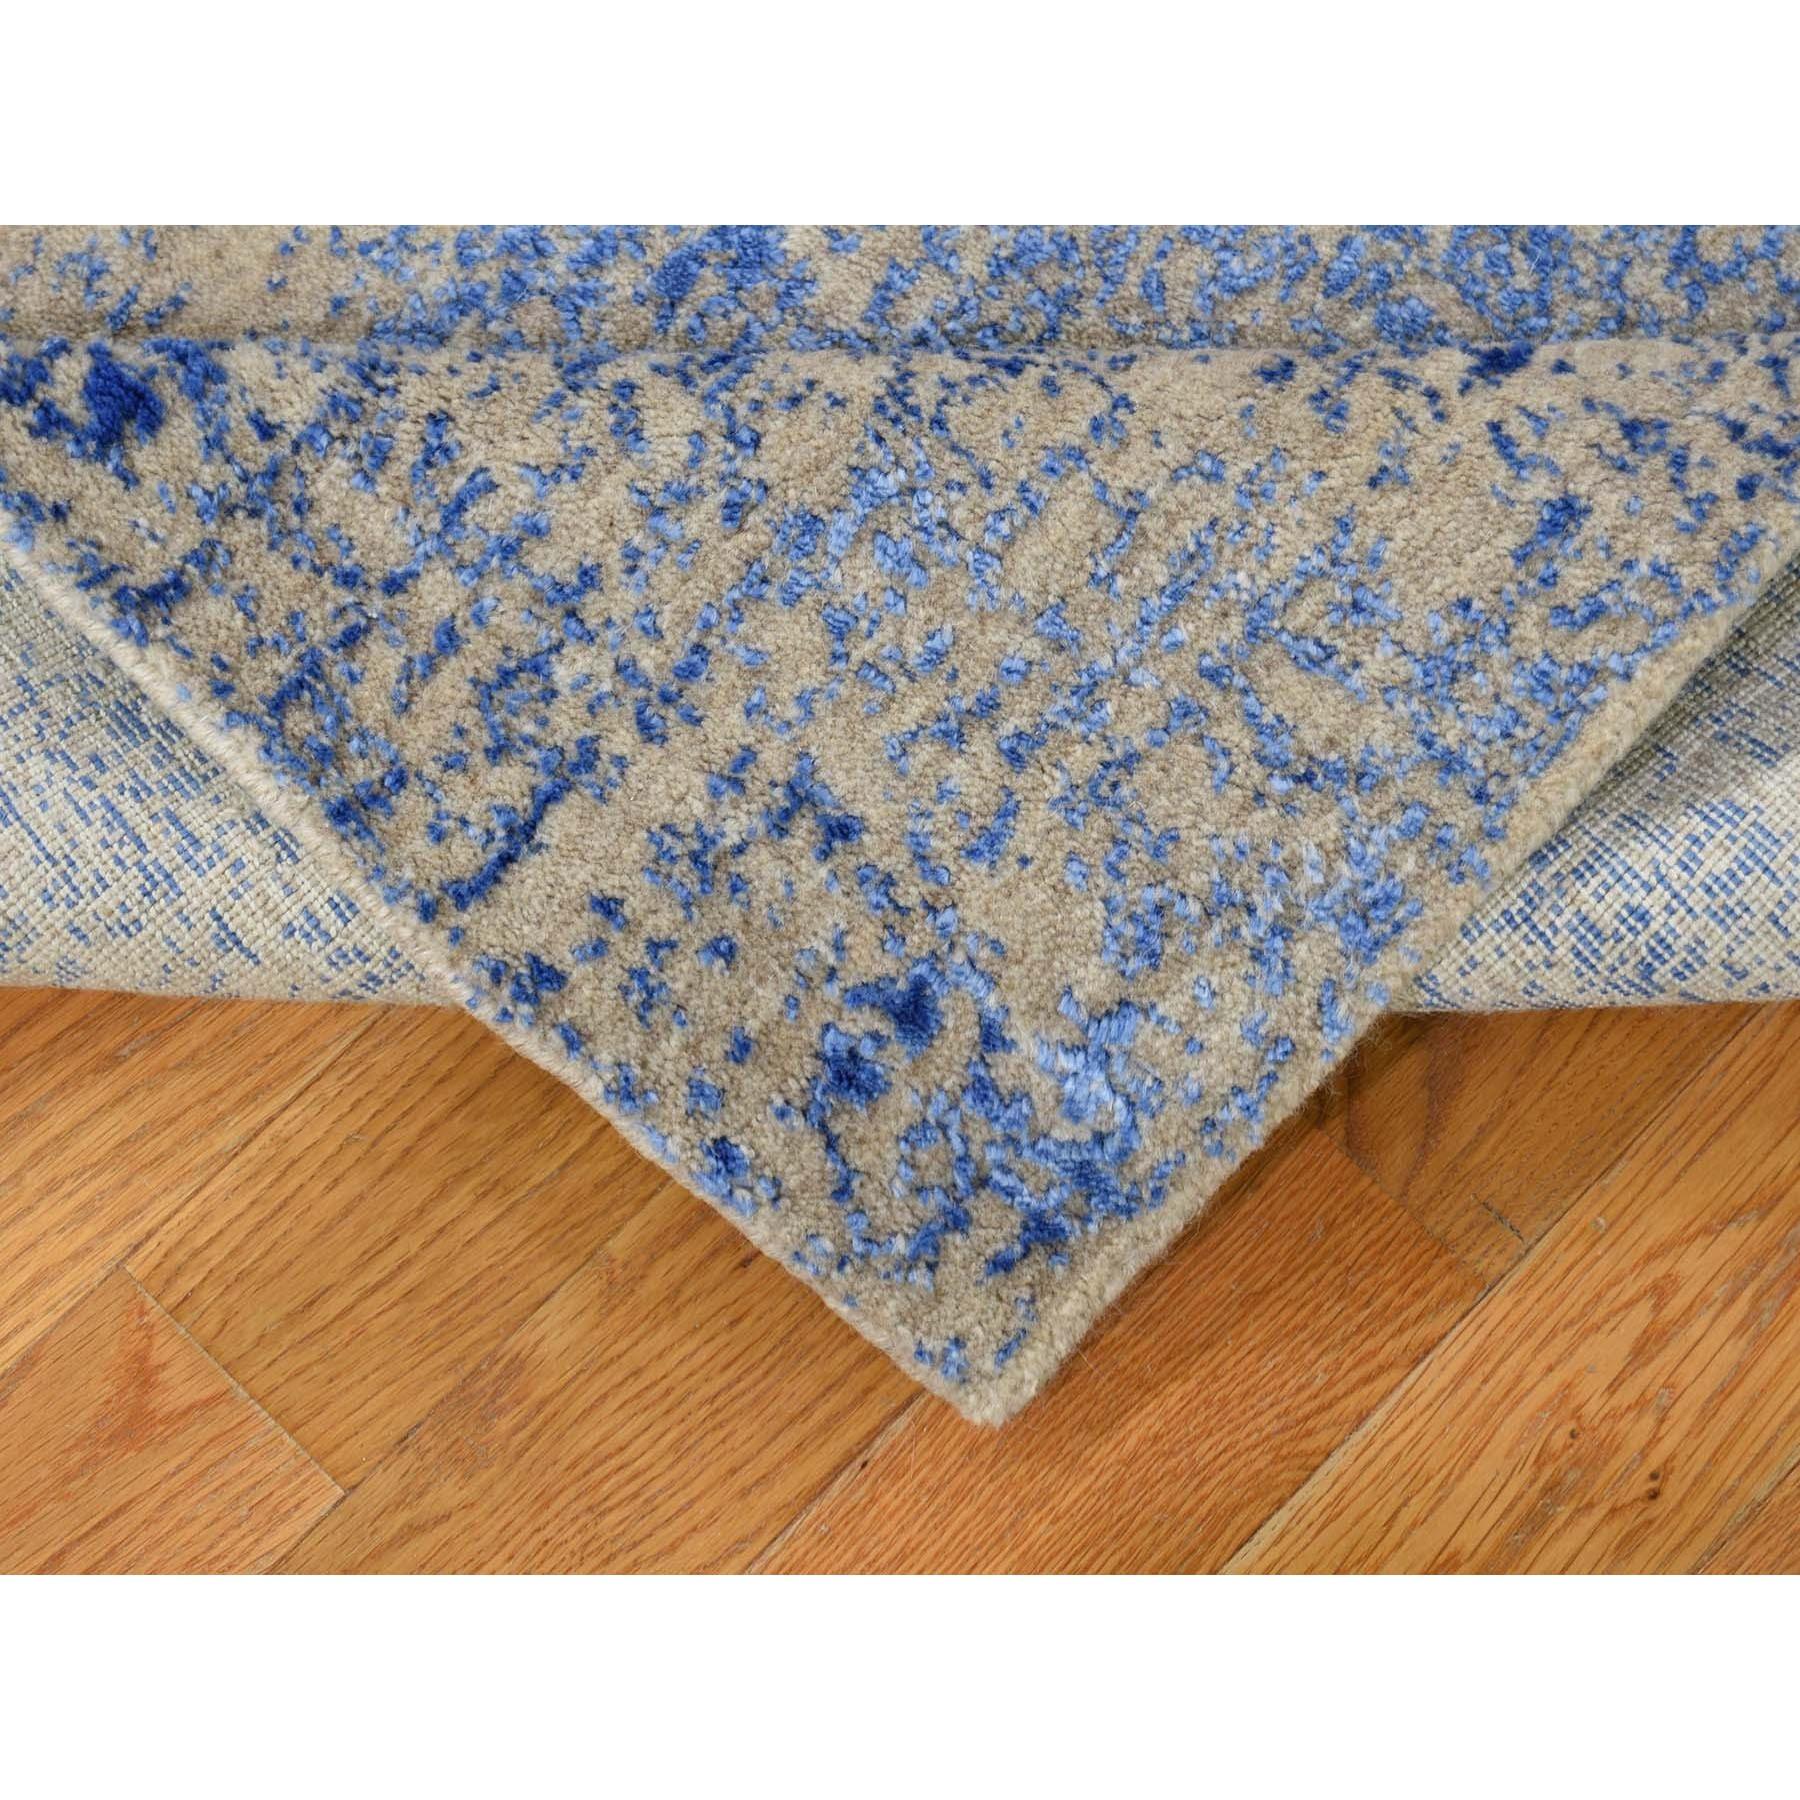 "2'5""x12' Wool And Silk Mamluk Design Jacquard Hand Loomed Runner Oriental Rug"